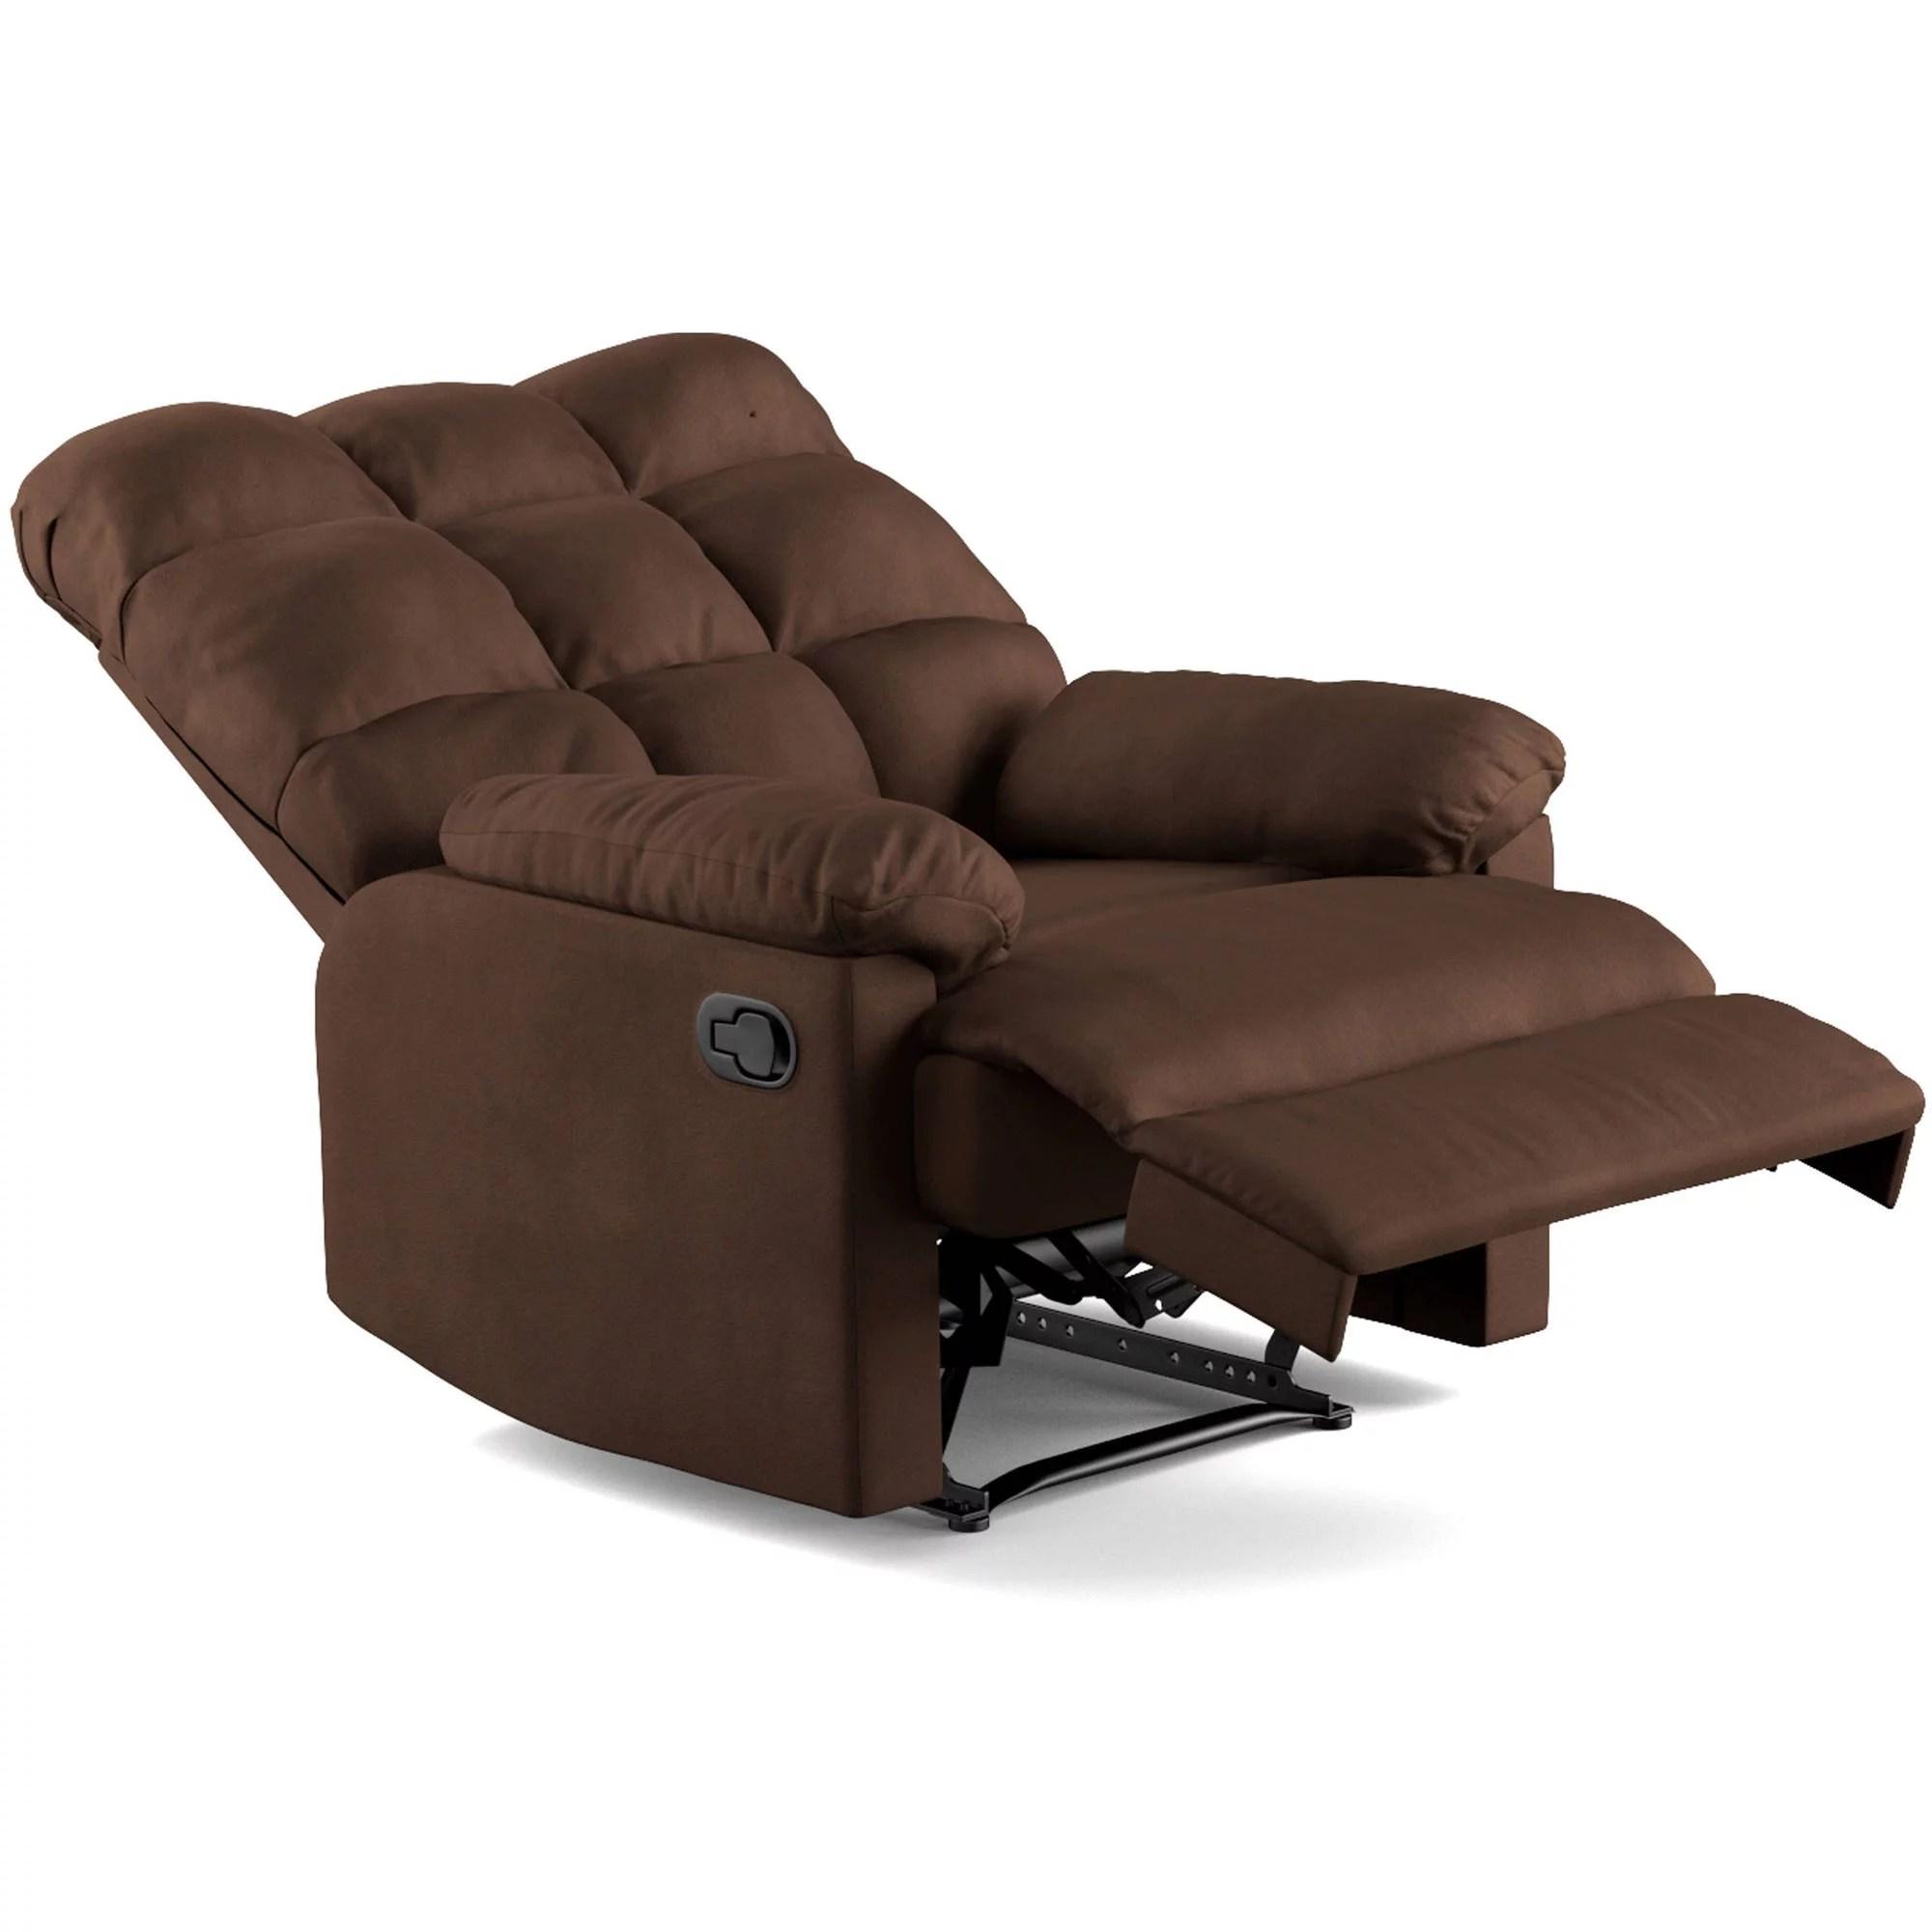 wall hugger recliner chair wood floor mat mainstays baja microfiber biscuit back multiple colors walmart com